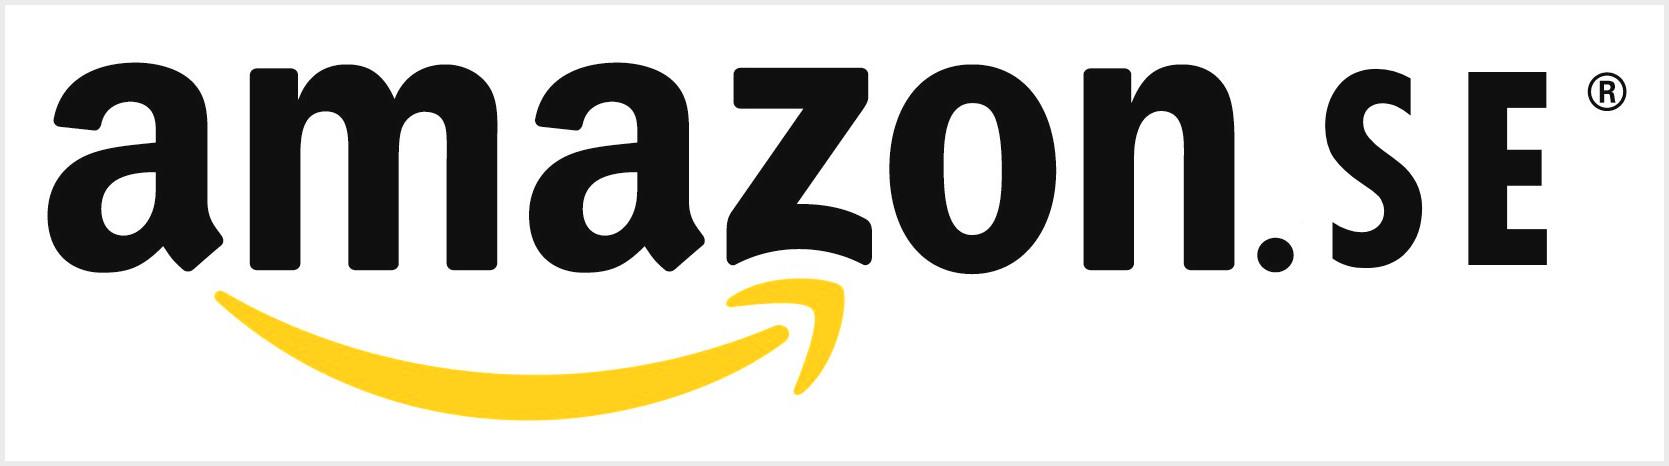 Amazon ett steg närmare en svensk lansering